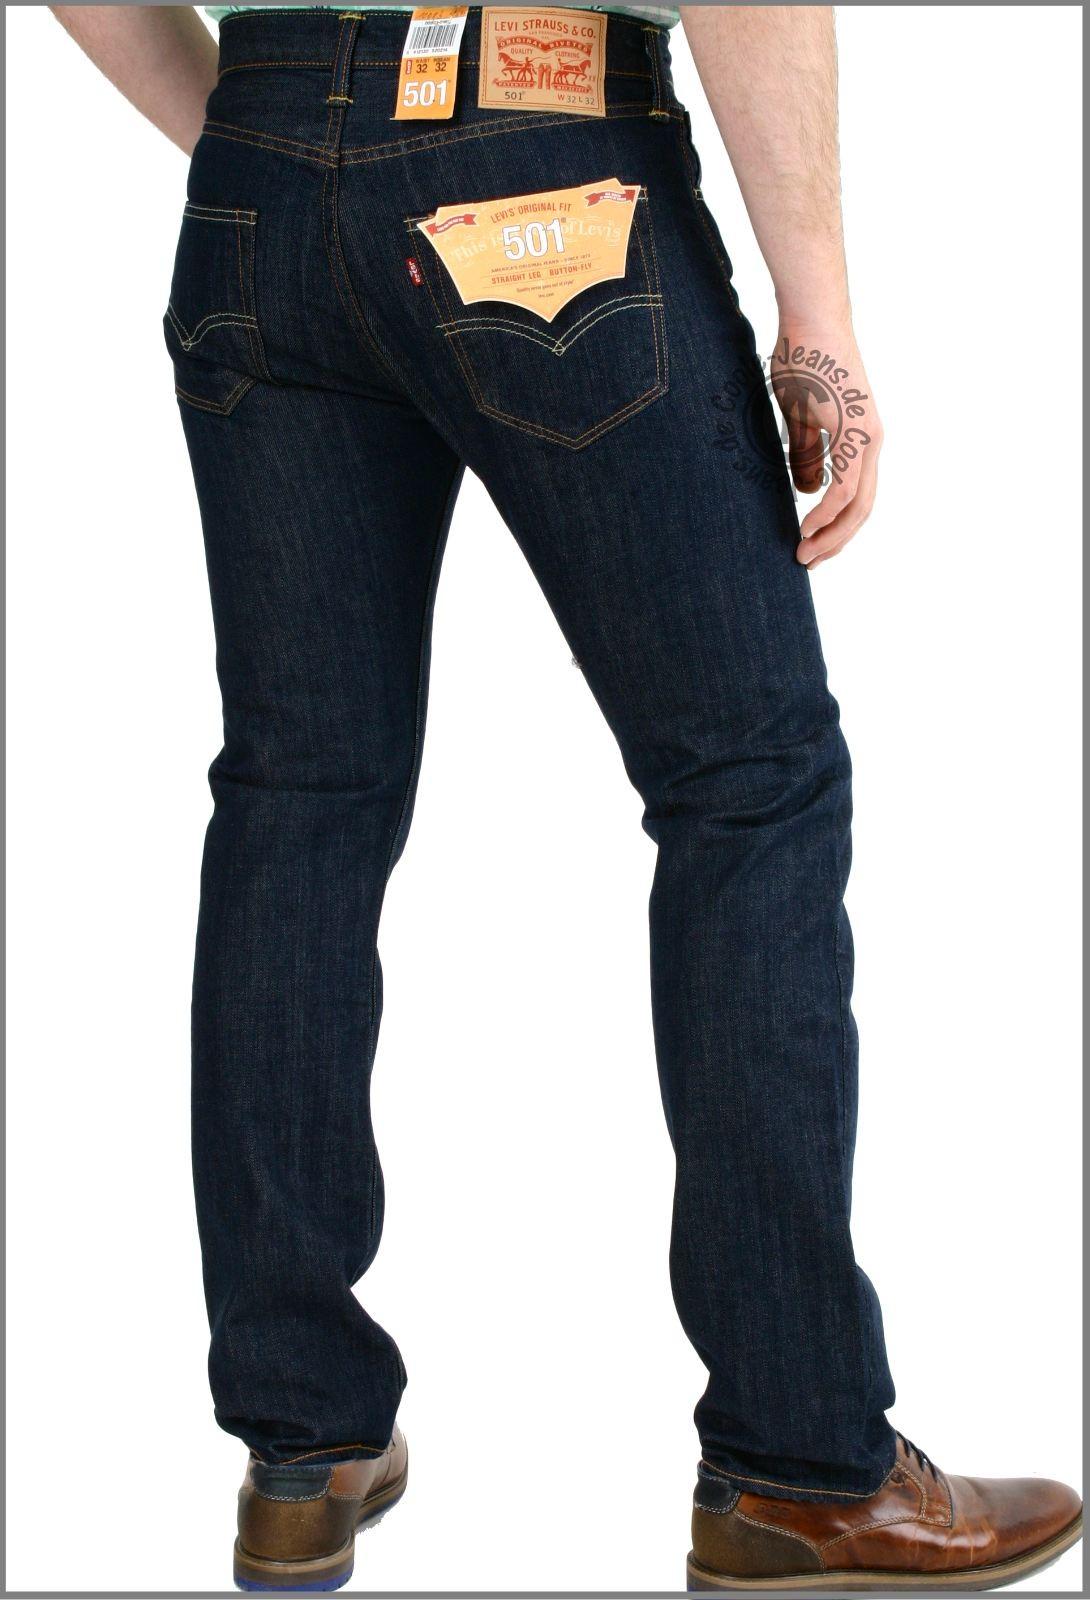 levis 501 jeans marlon levis 5010162 levis herrenjeans 77 72. Black Bedroom Furniture Sets. Home Design Ideas